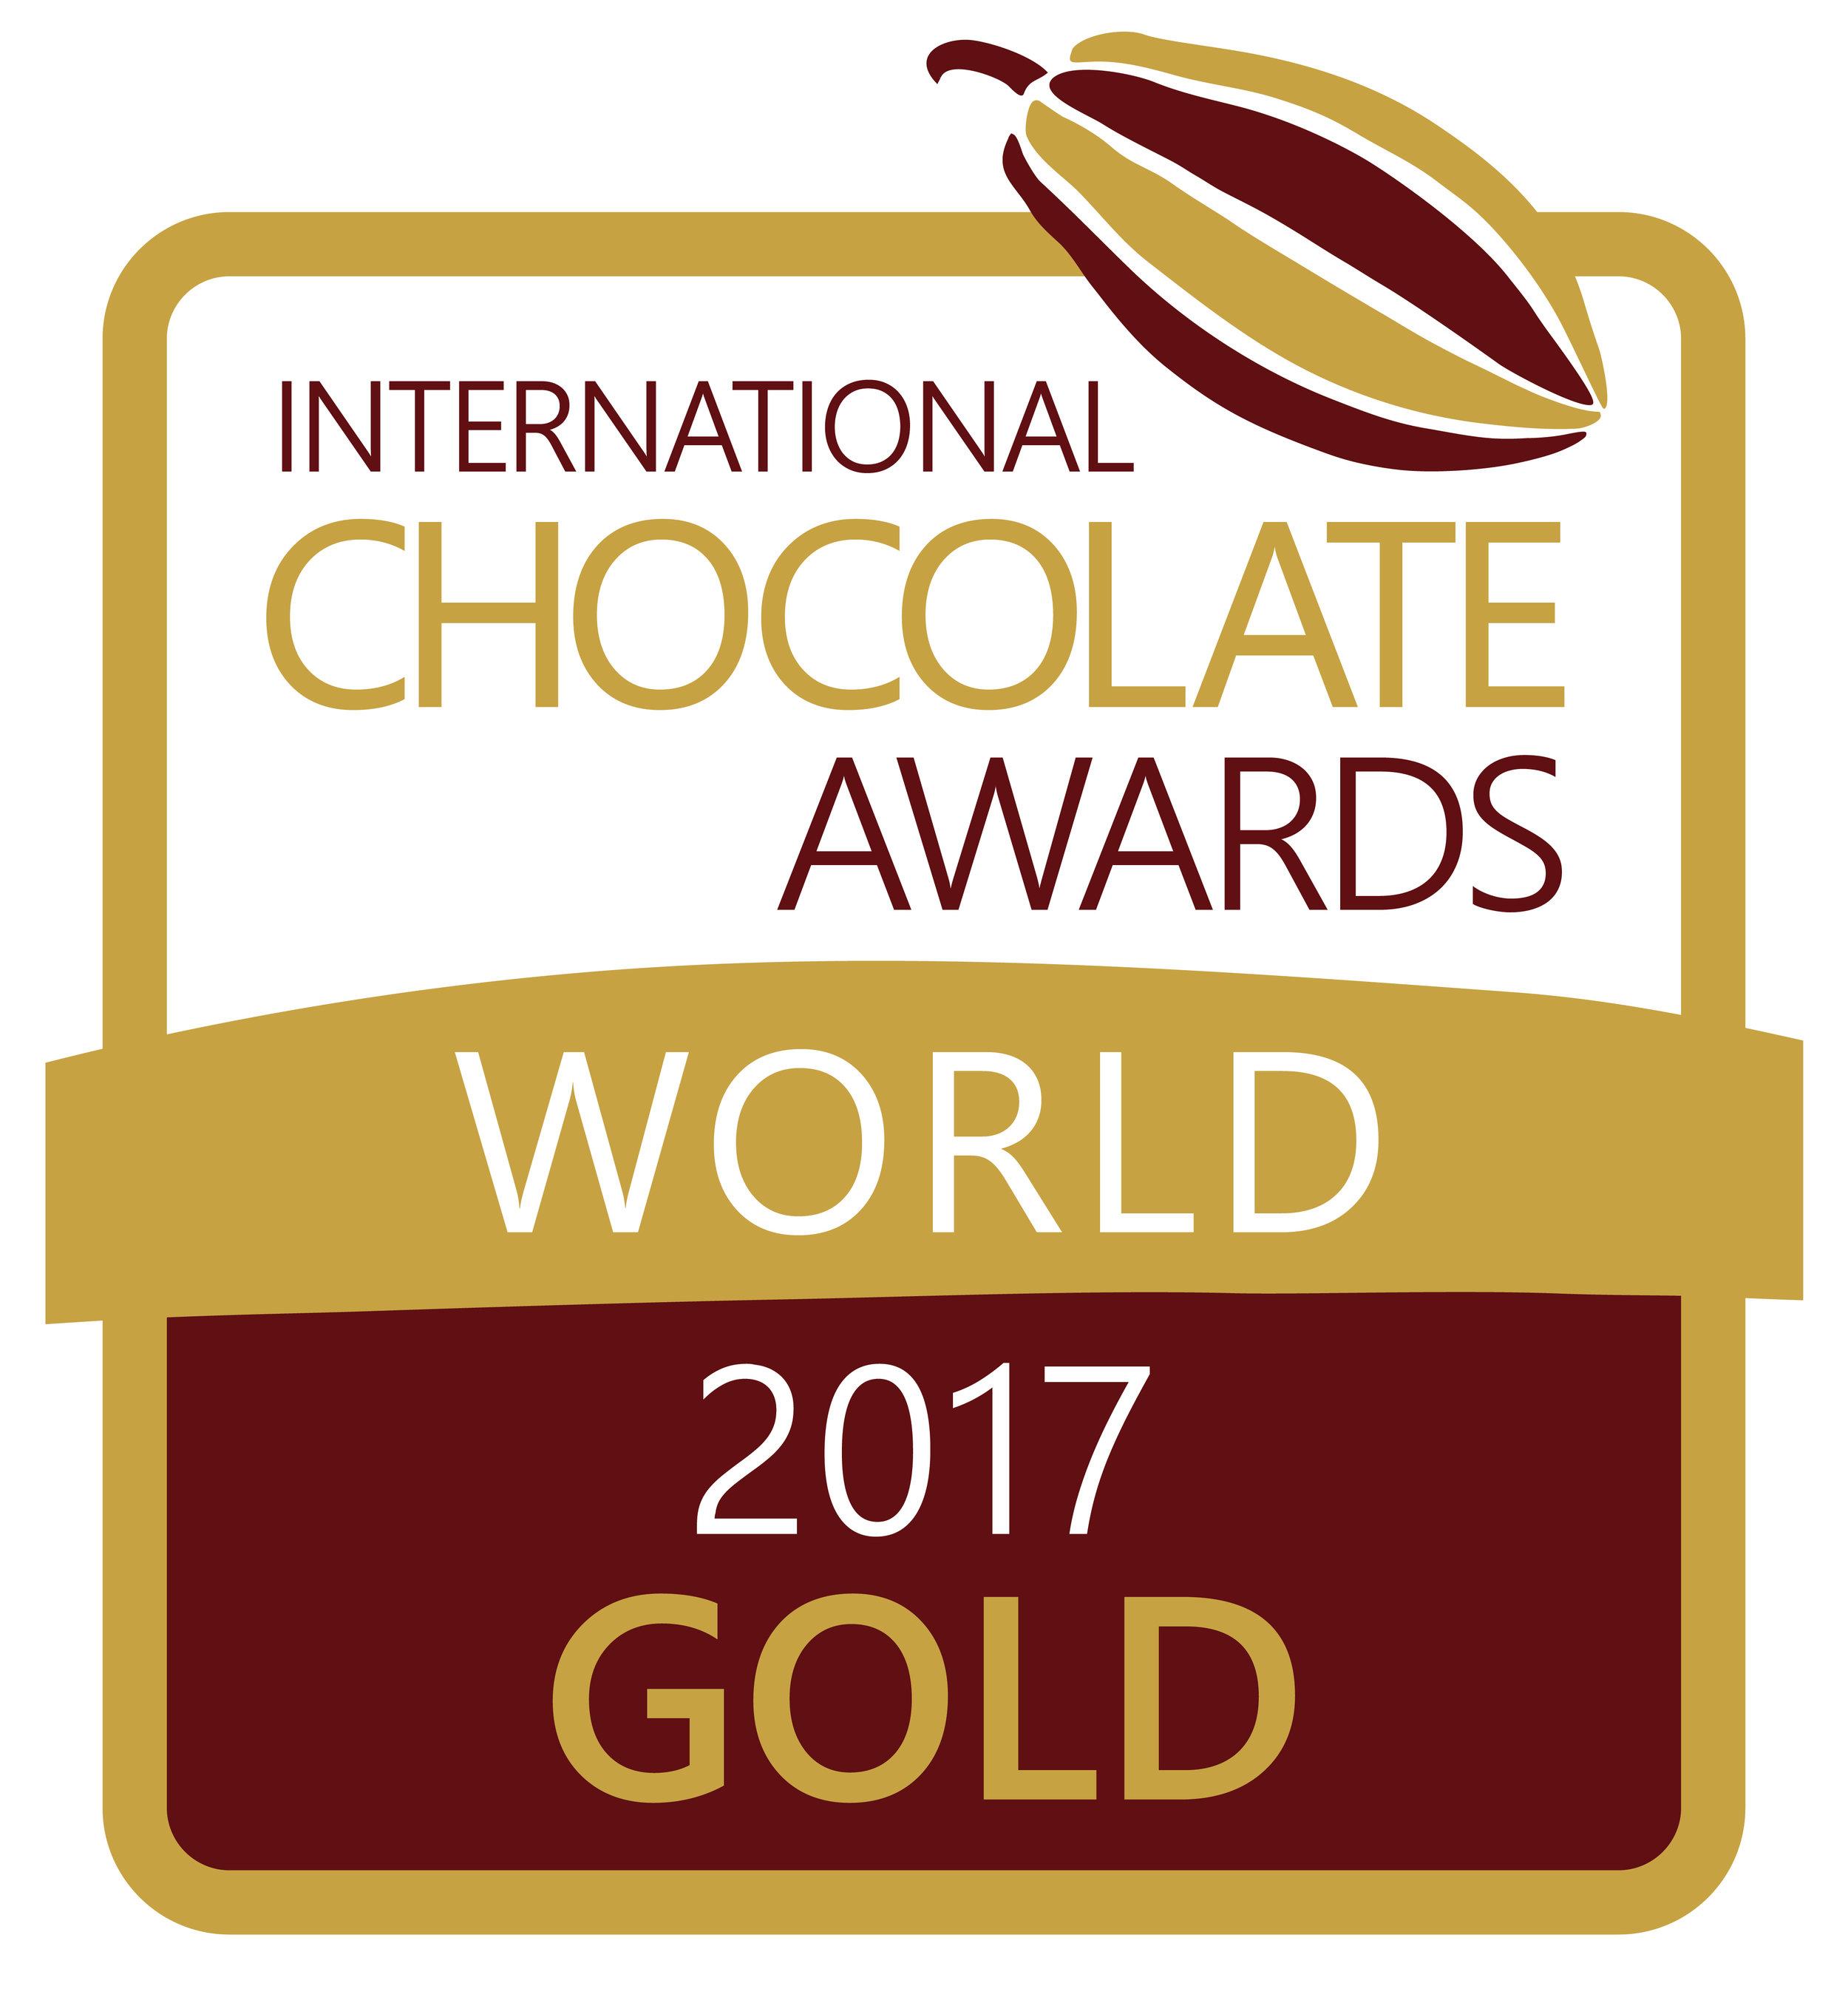 ica-prize-logo-2017-gold-world-rgb.jpg